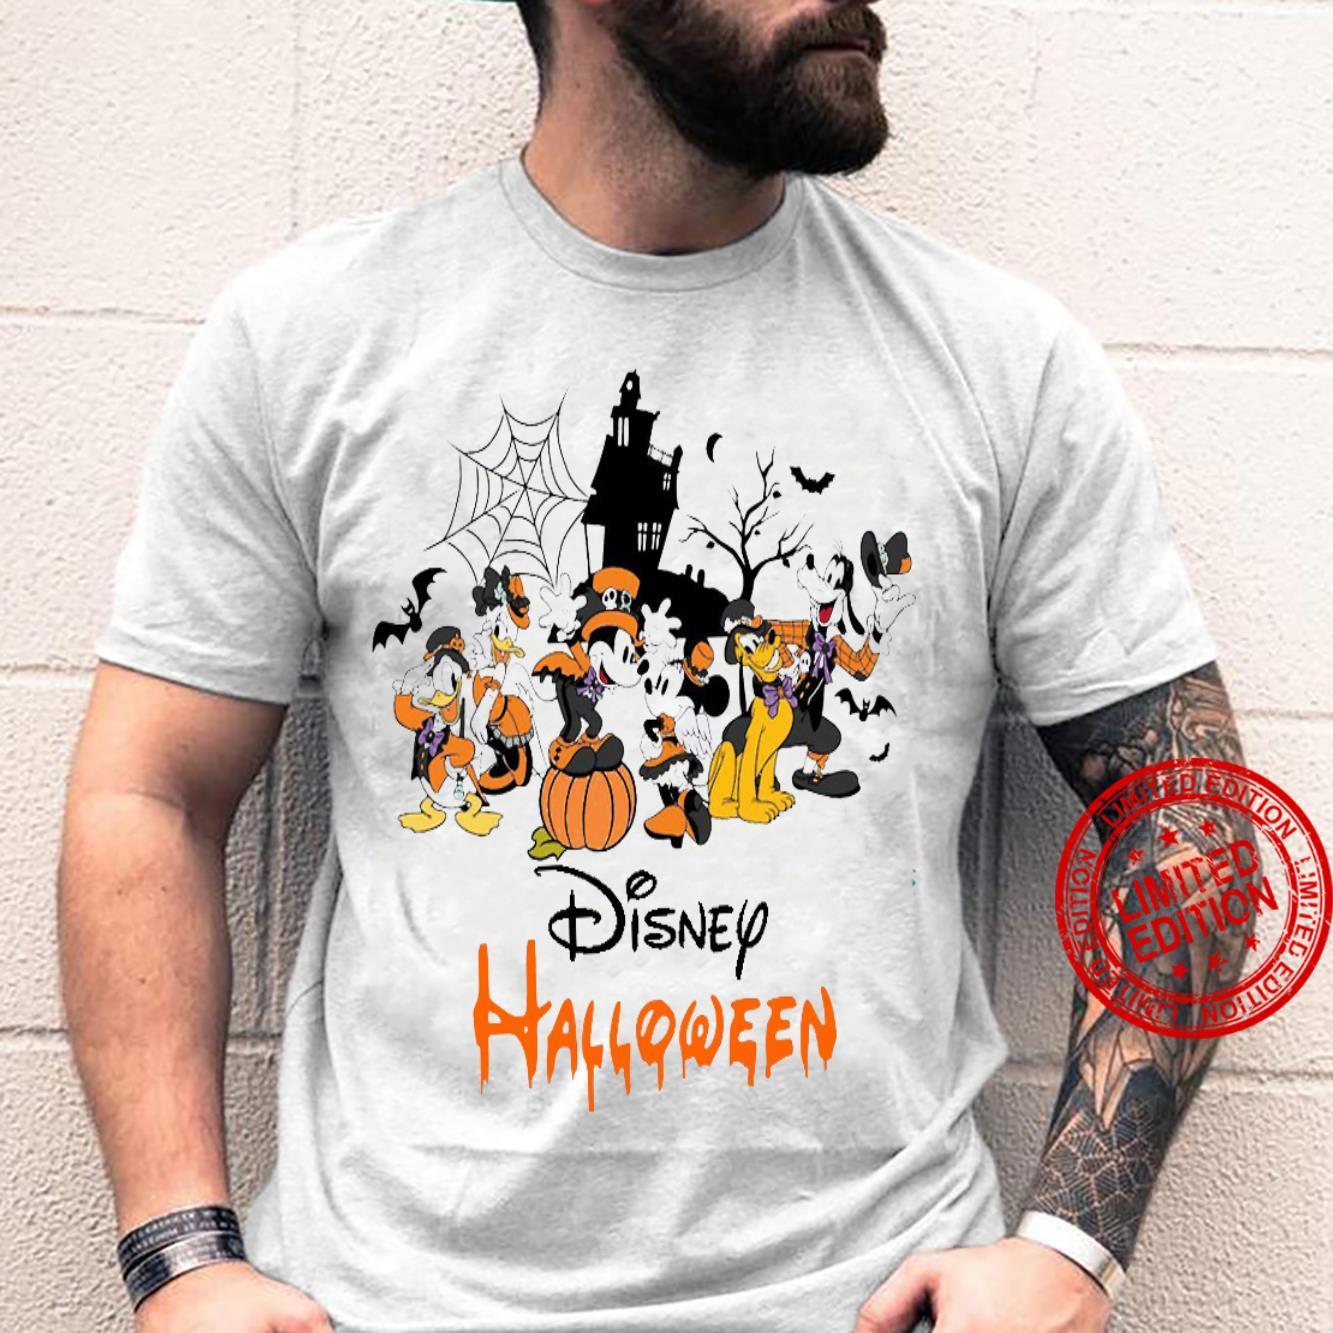 Halloween Shirt unisex